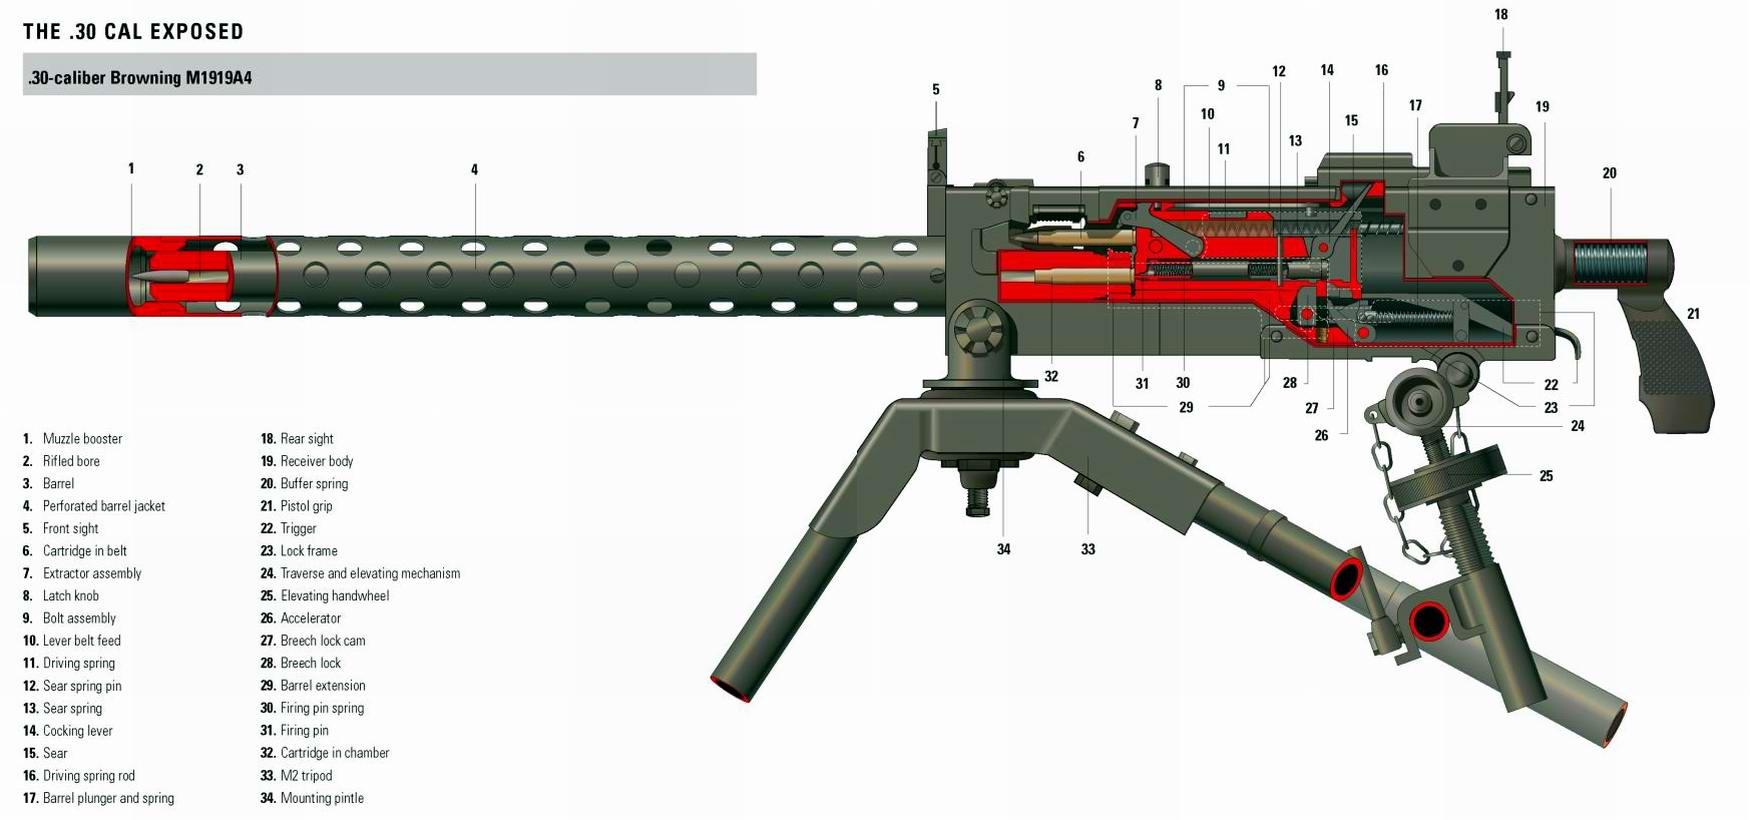 Browning M1919A4 - станковый пулемет образца 1919 года (США)